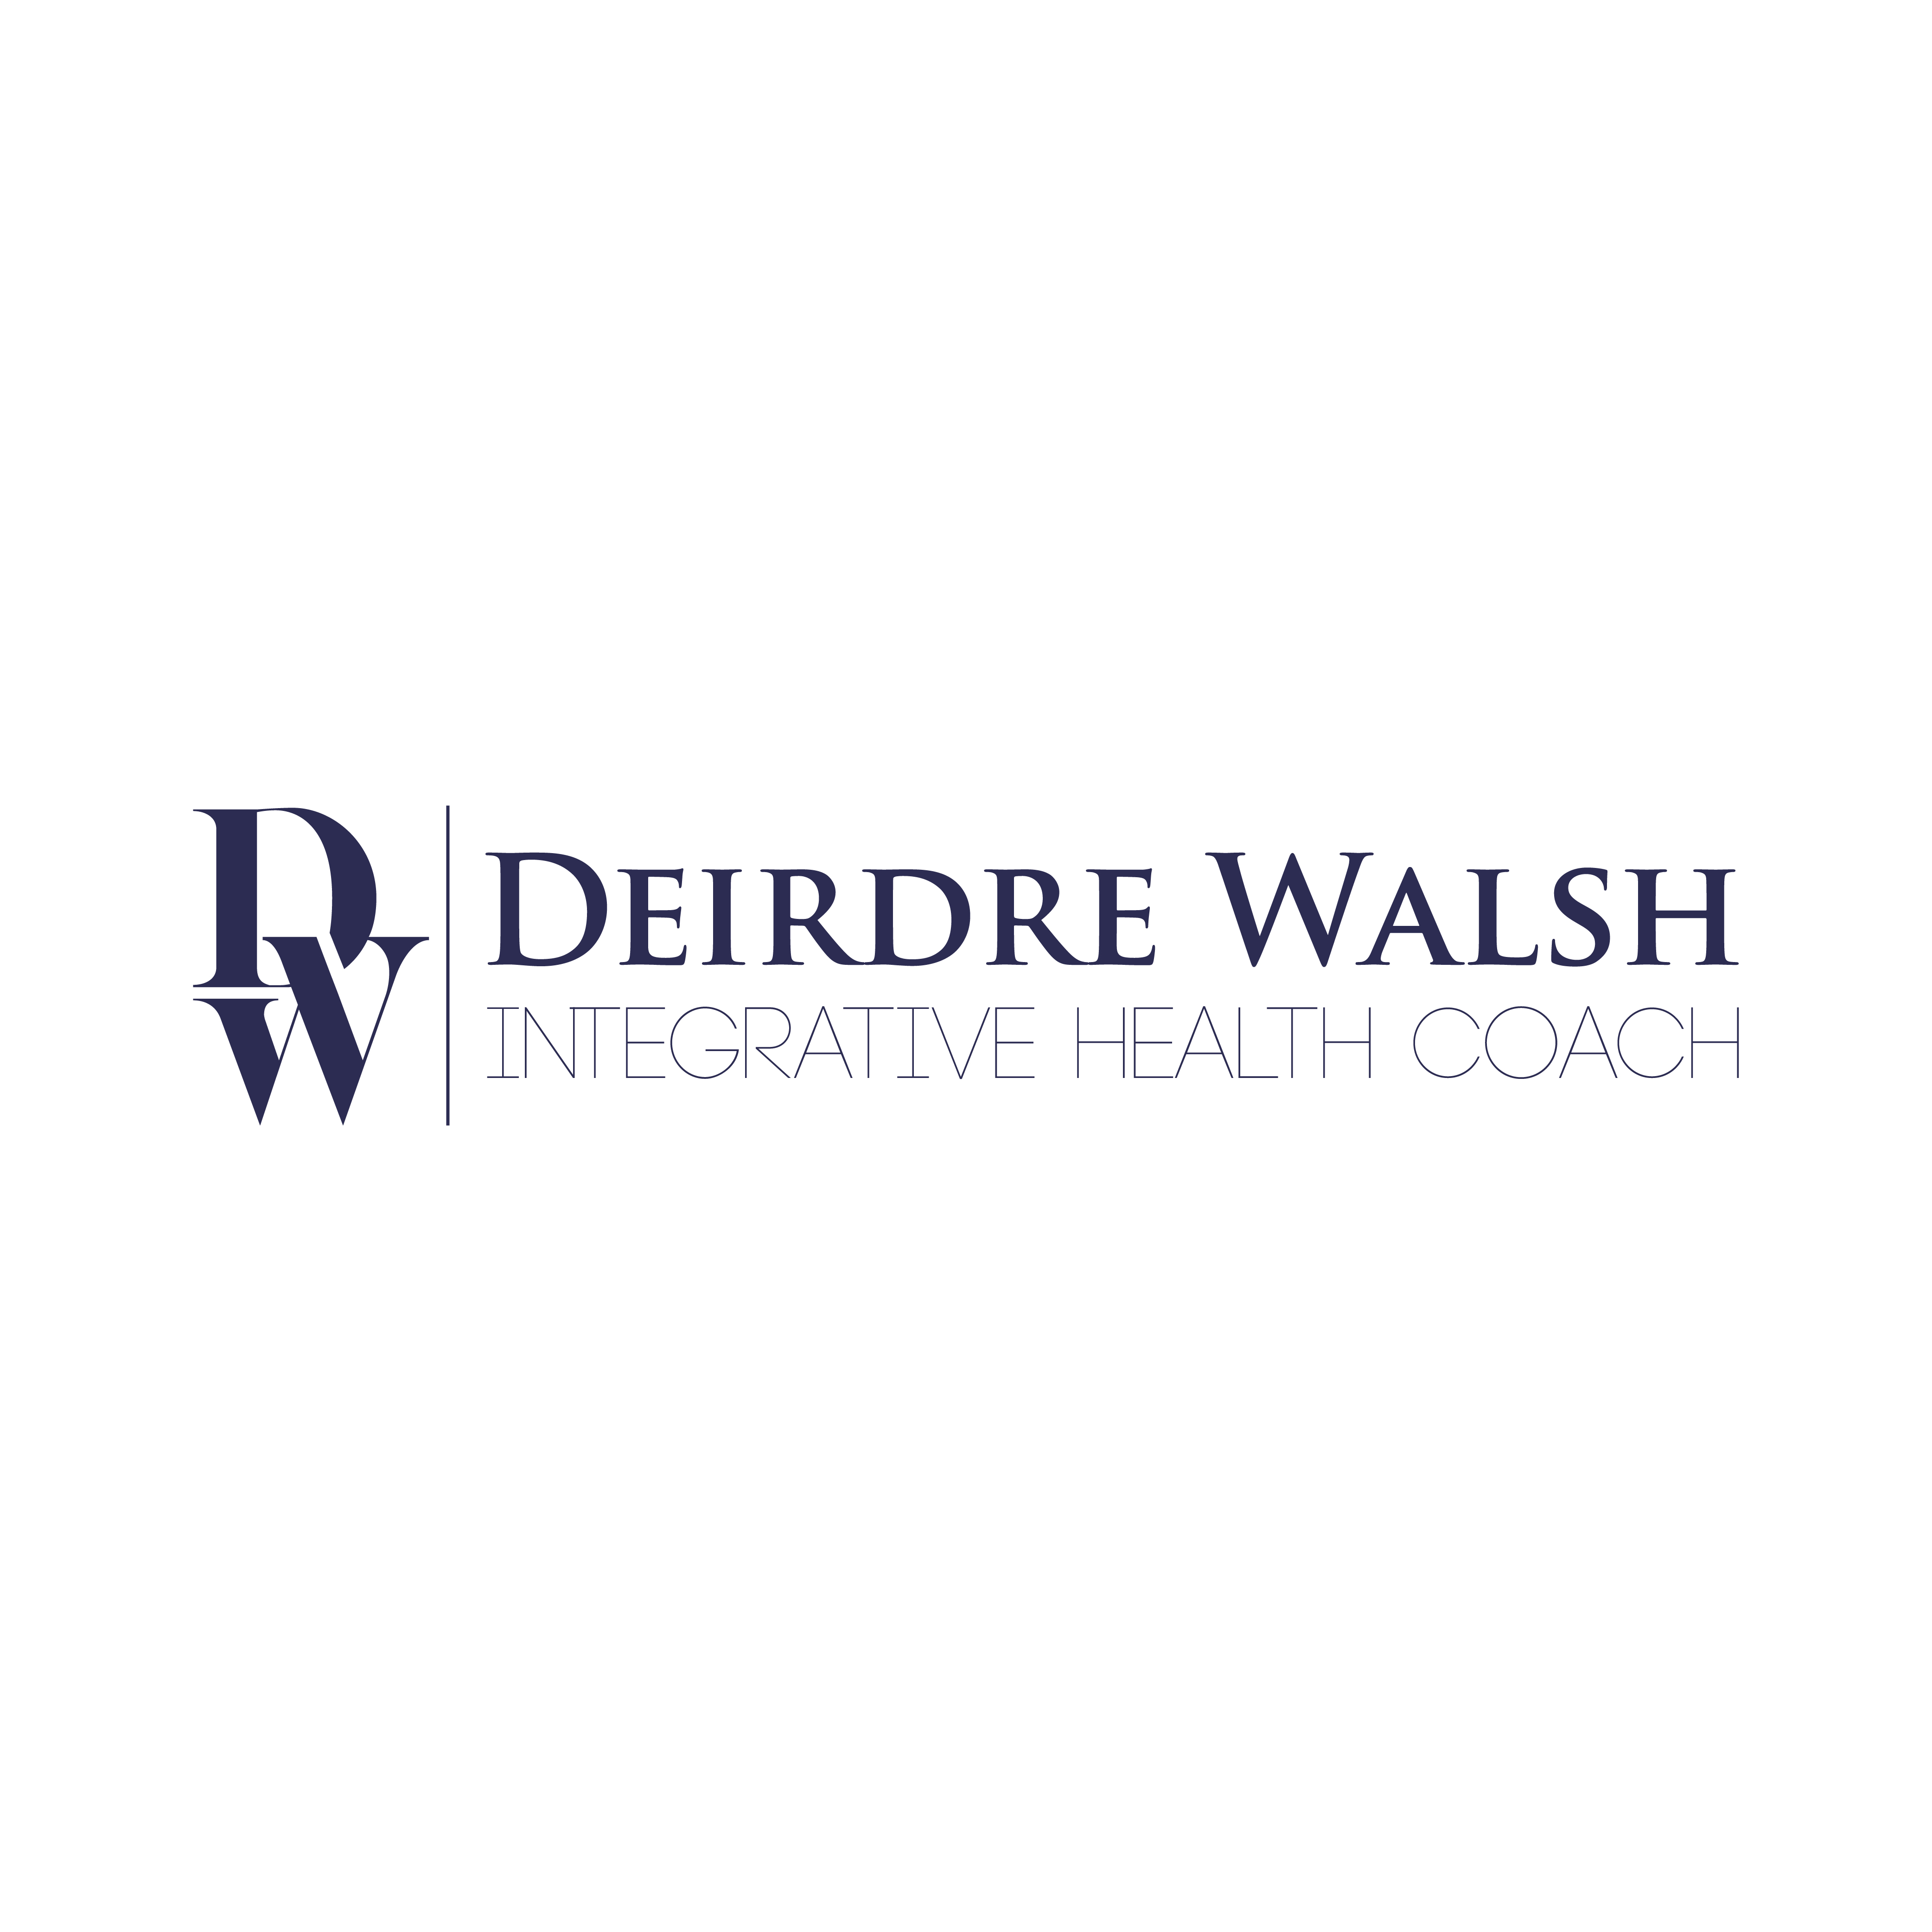 Deirdre Walsh